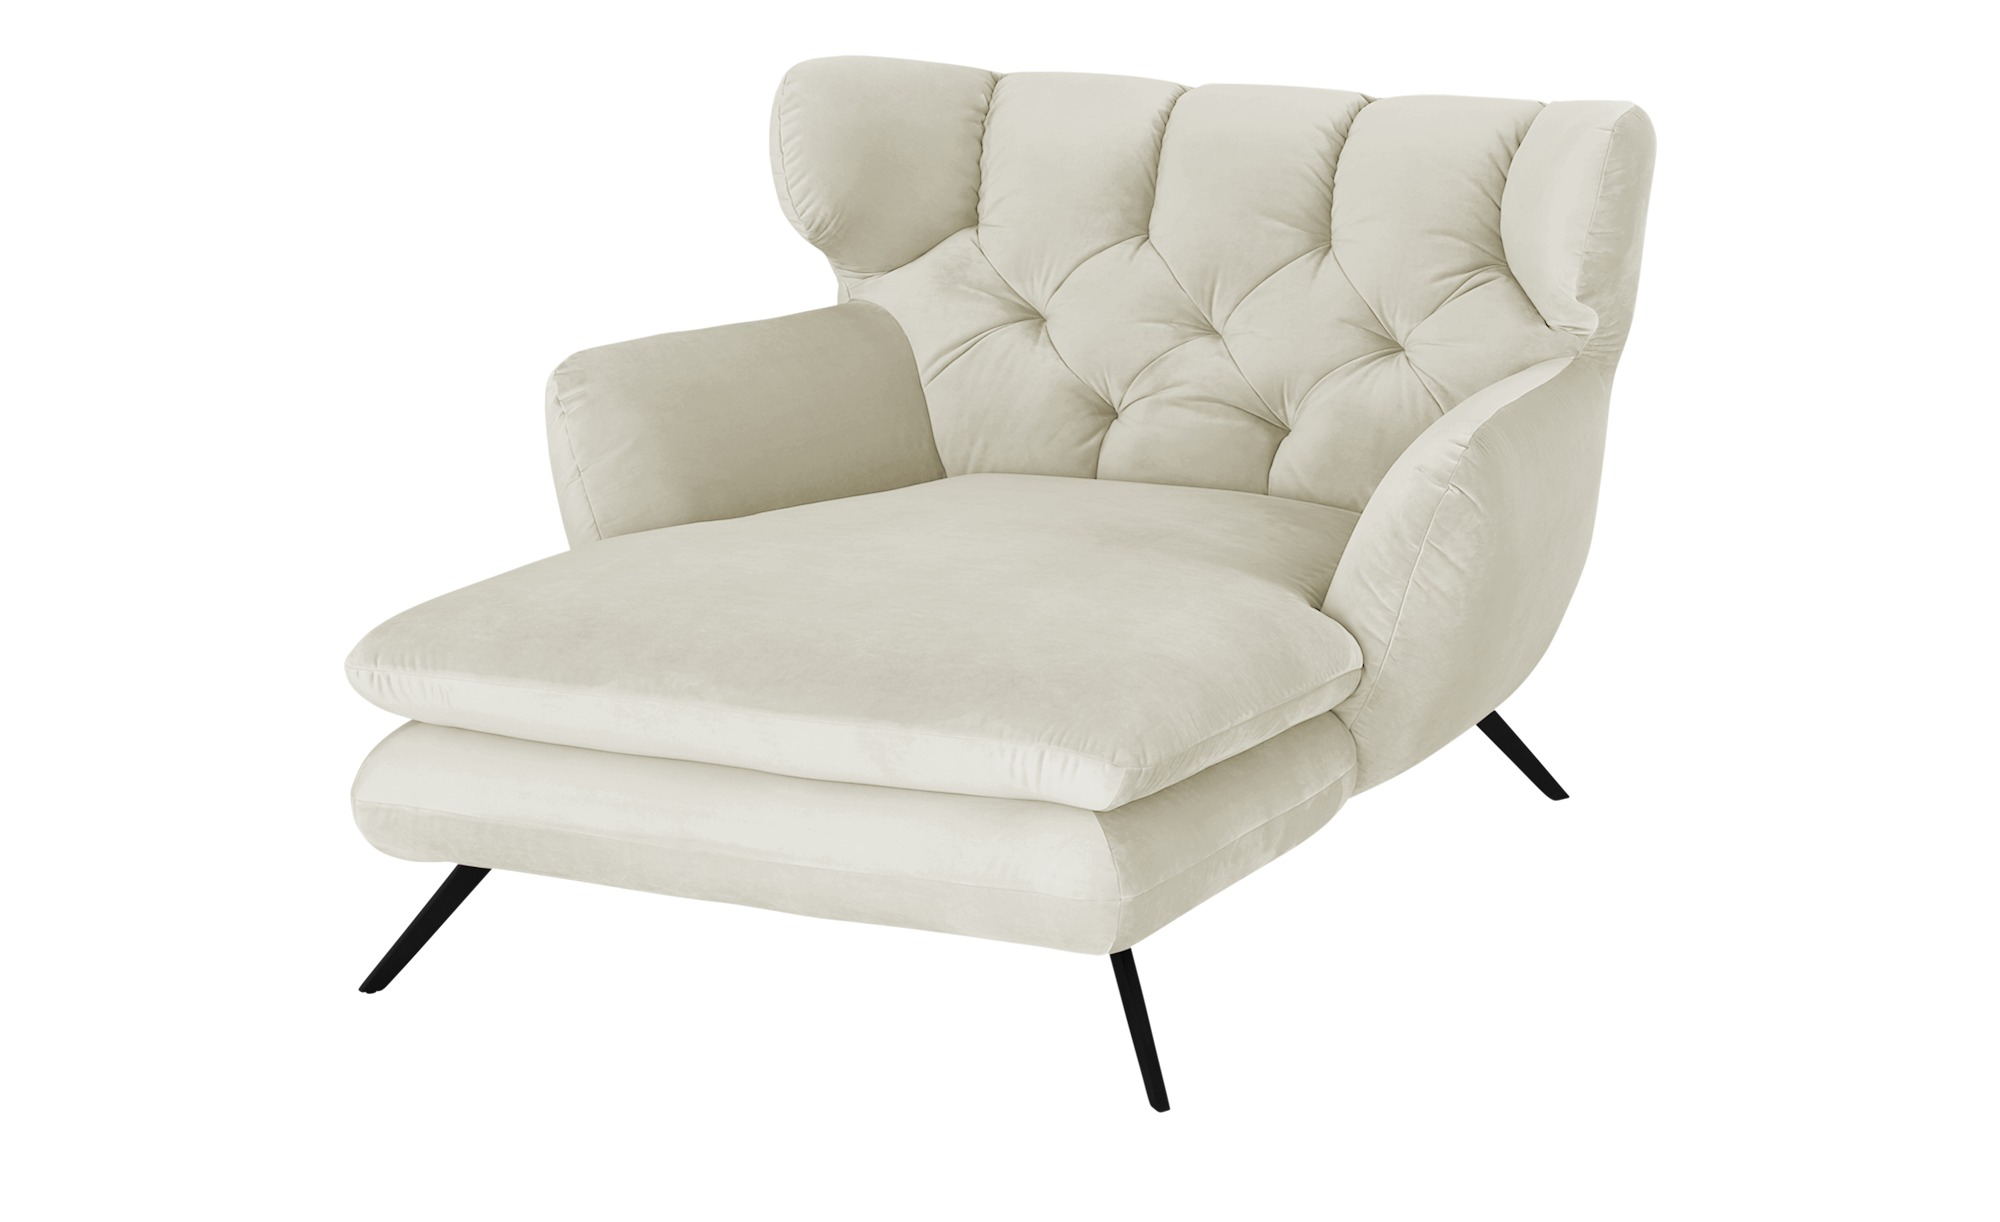 pop Longseat-Sessel  Caldara ¦ creme ¦ Maße (cm): B: 126 H: 94 T: 160 Polstermöbel > Sessel > Ohrensessel - Höffner